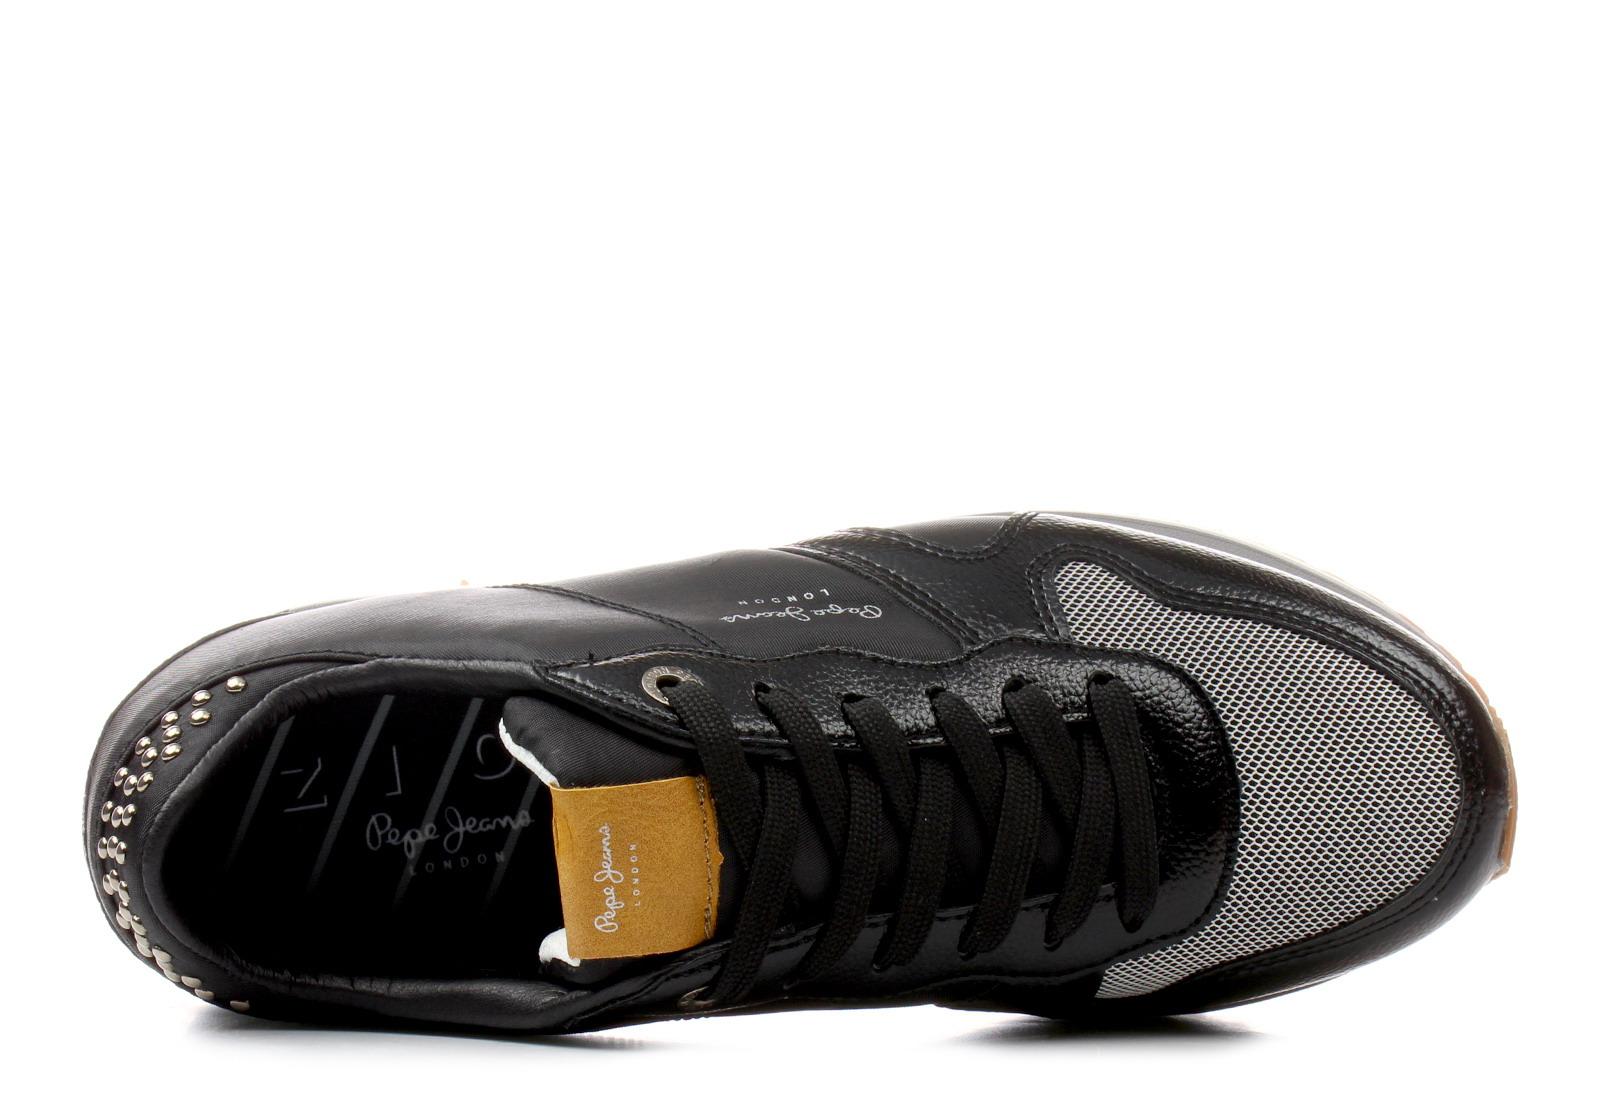 Pepe Jeans Shoes - Zion - PLS30787999 - Online shop for sneakers ... 75a7dac34b